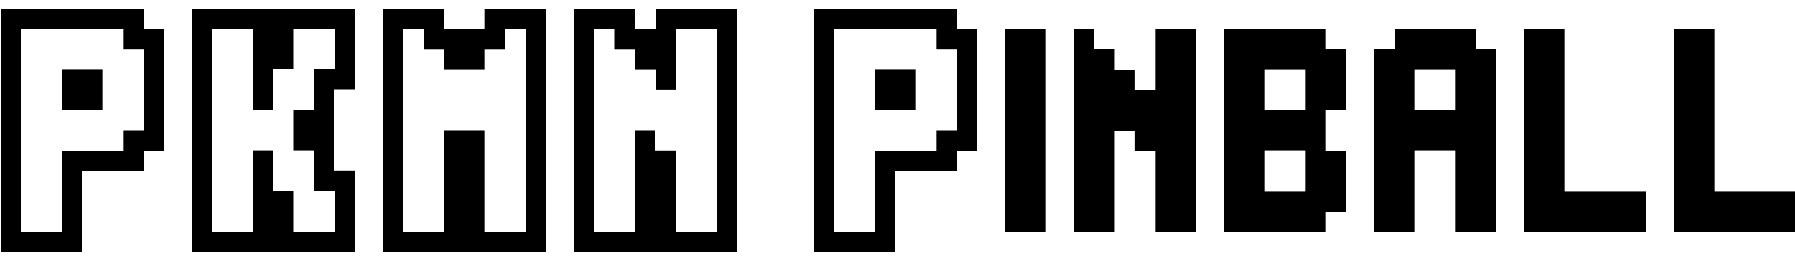 PKMN Pinball